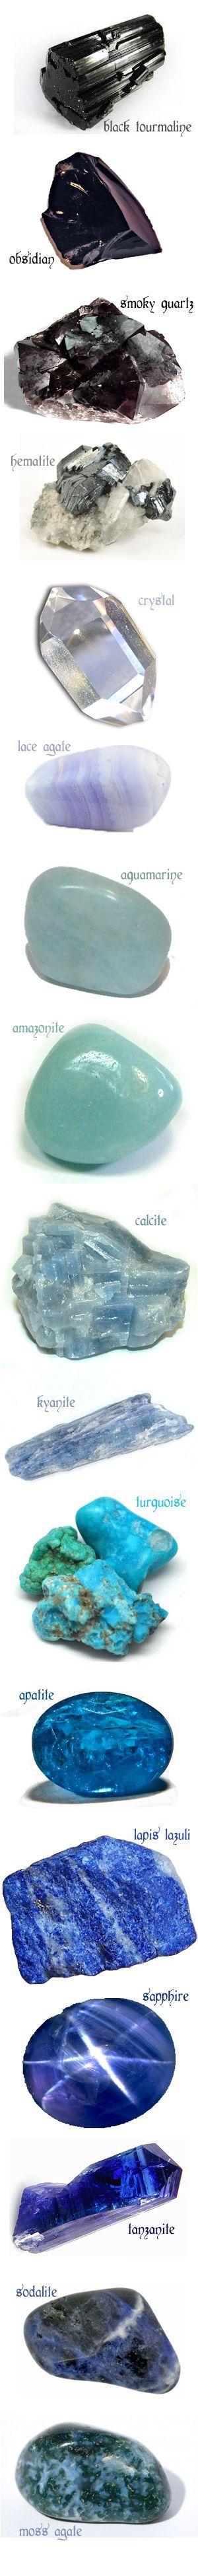 Le Sfumature dei Cristalli e Gemme. Splende.